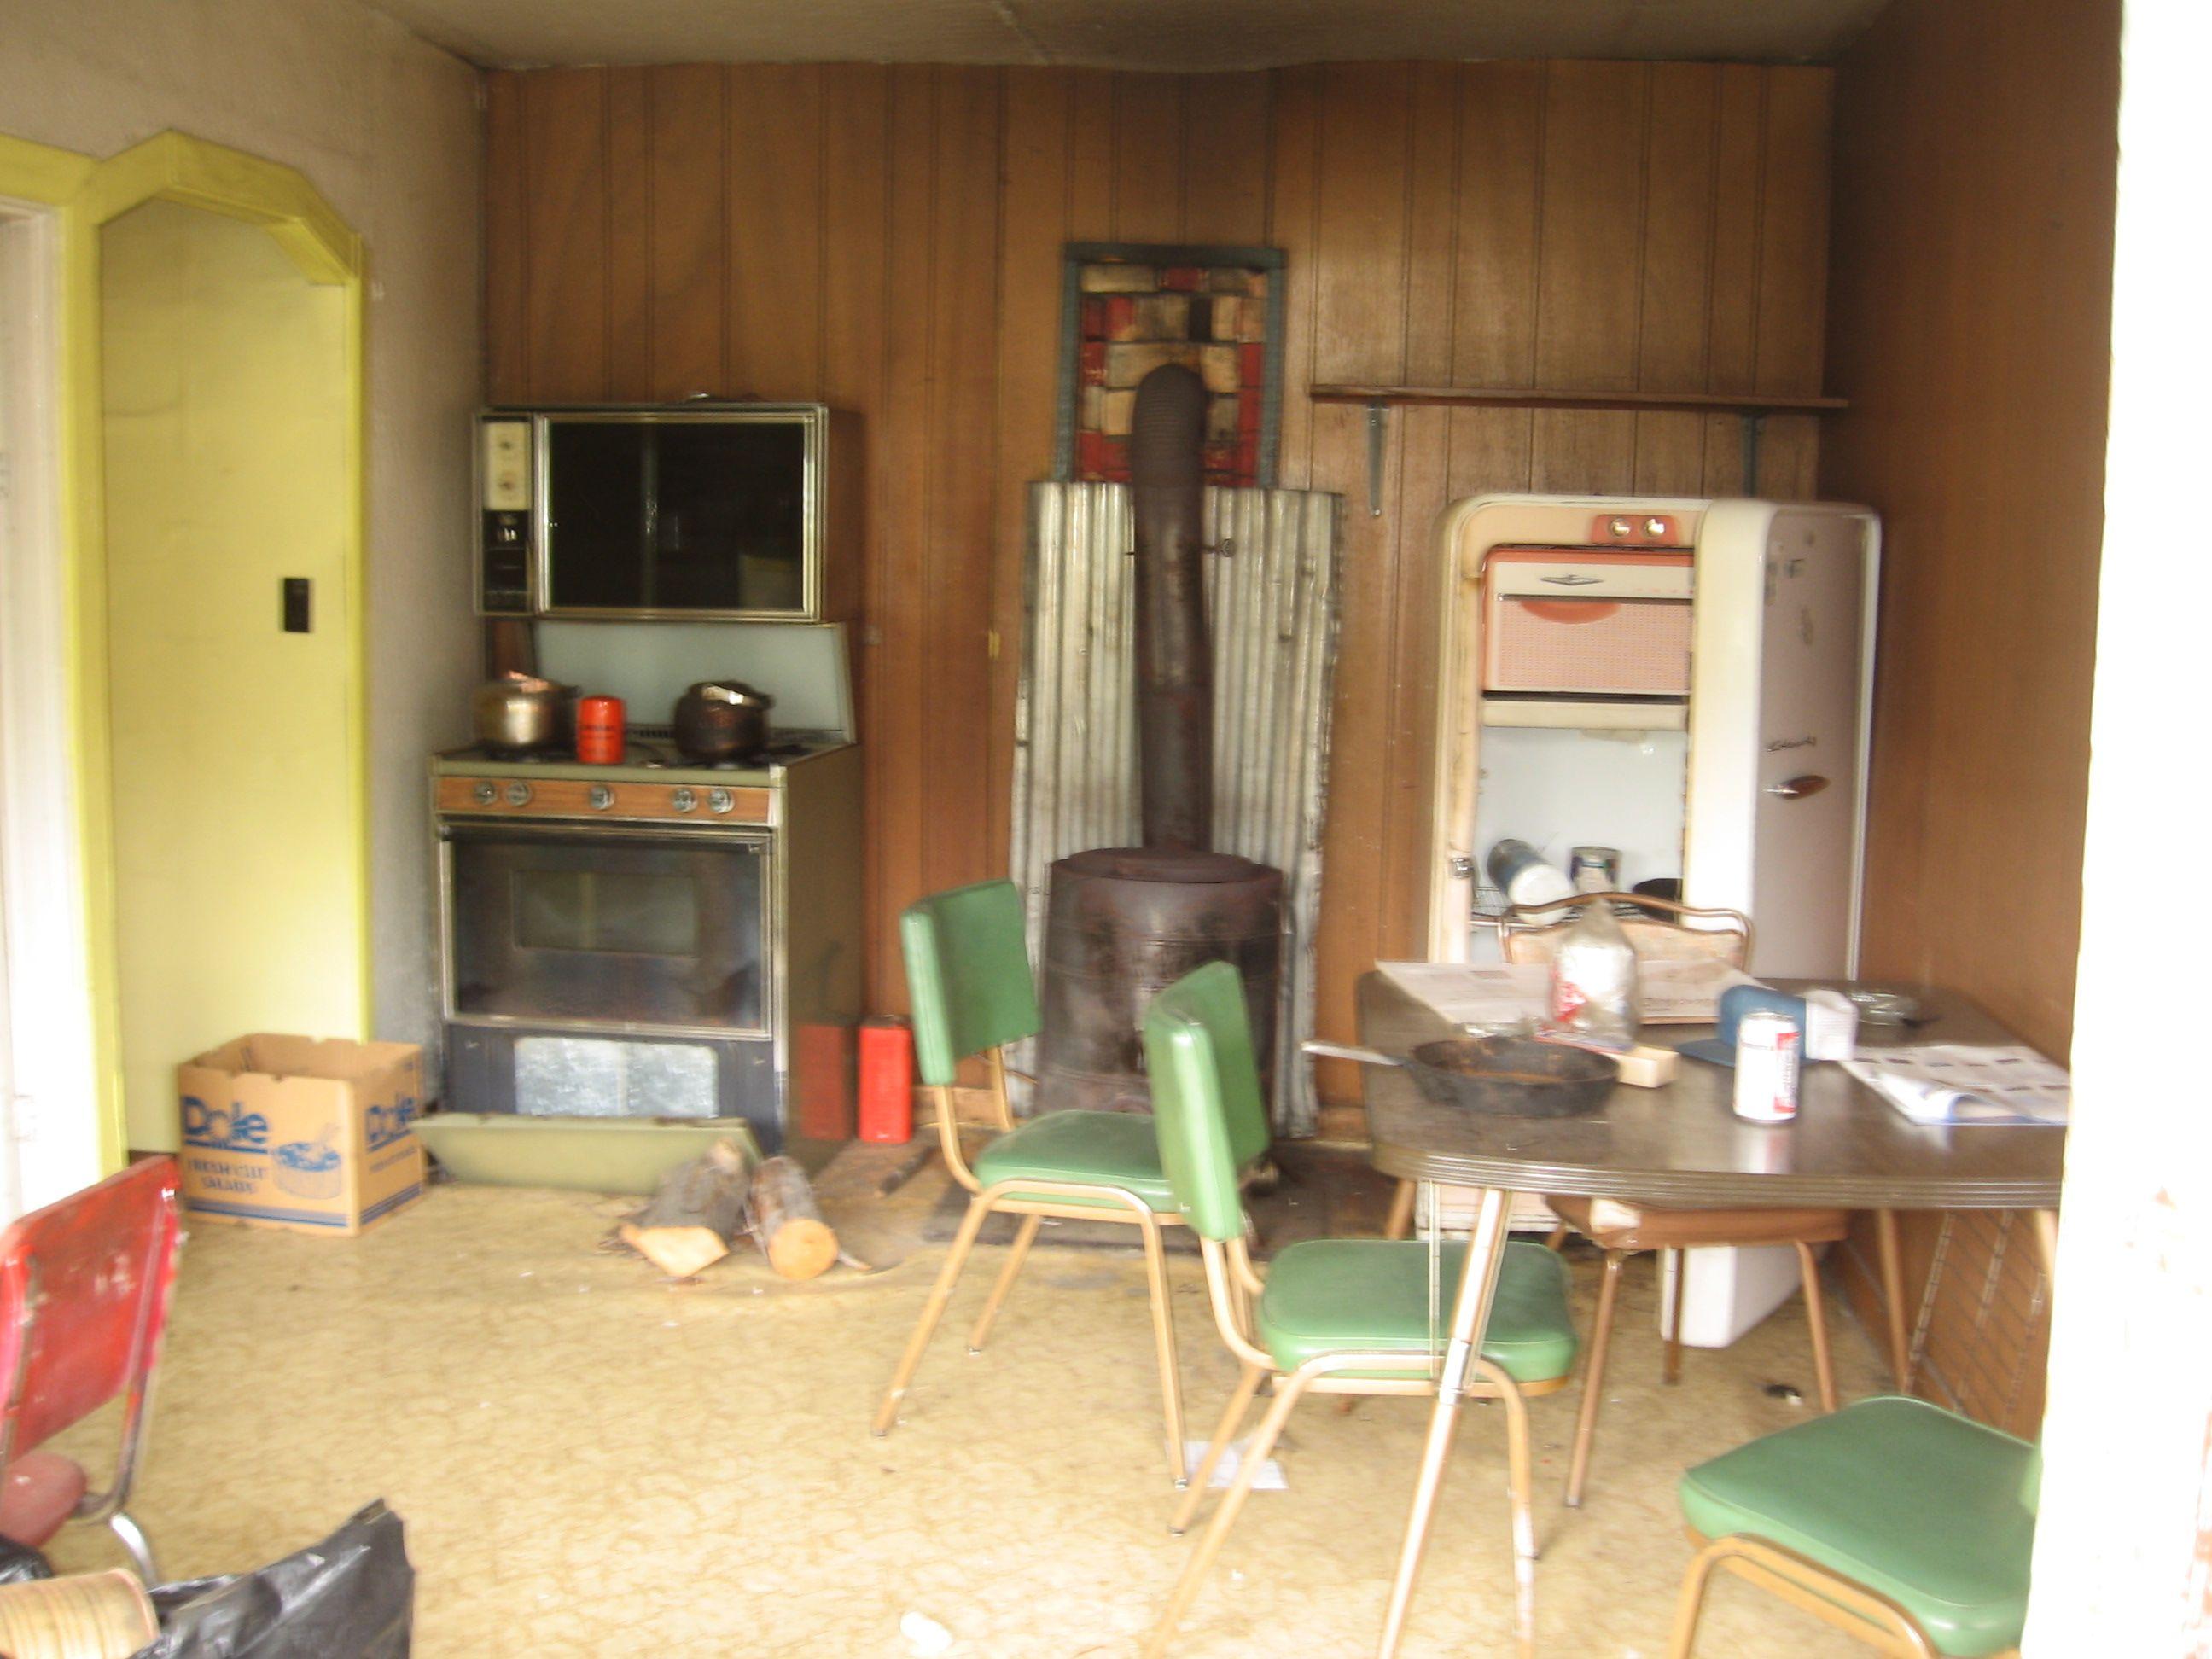 abandoned kitchen Northern B.C. 2008 Apartment kitchen